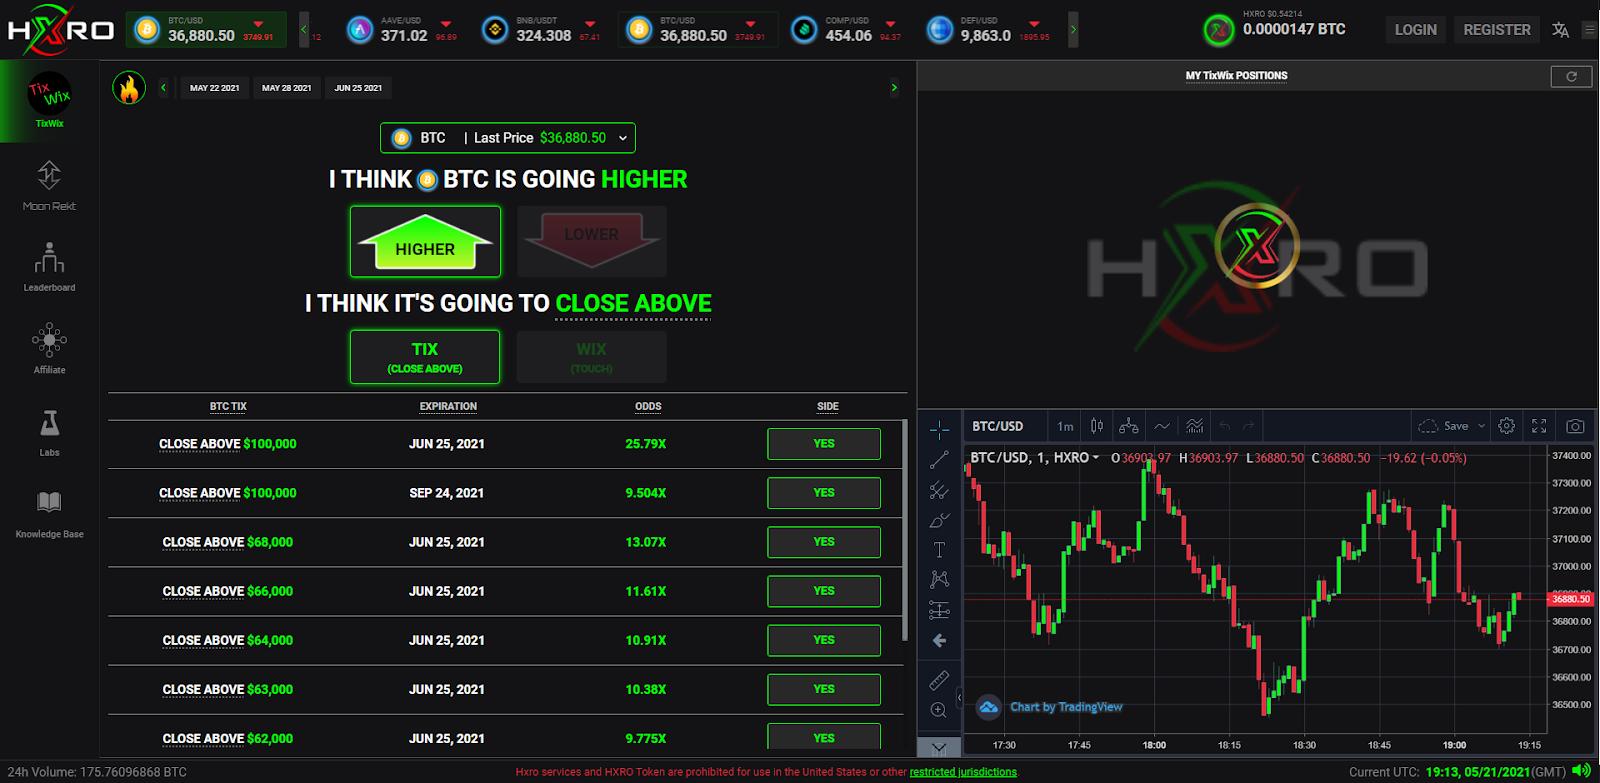 hxro trading interface